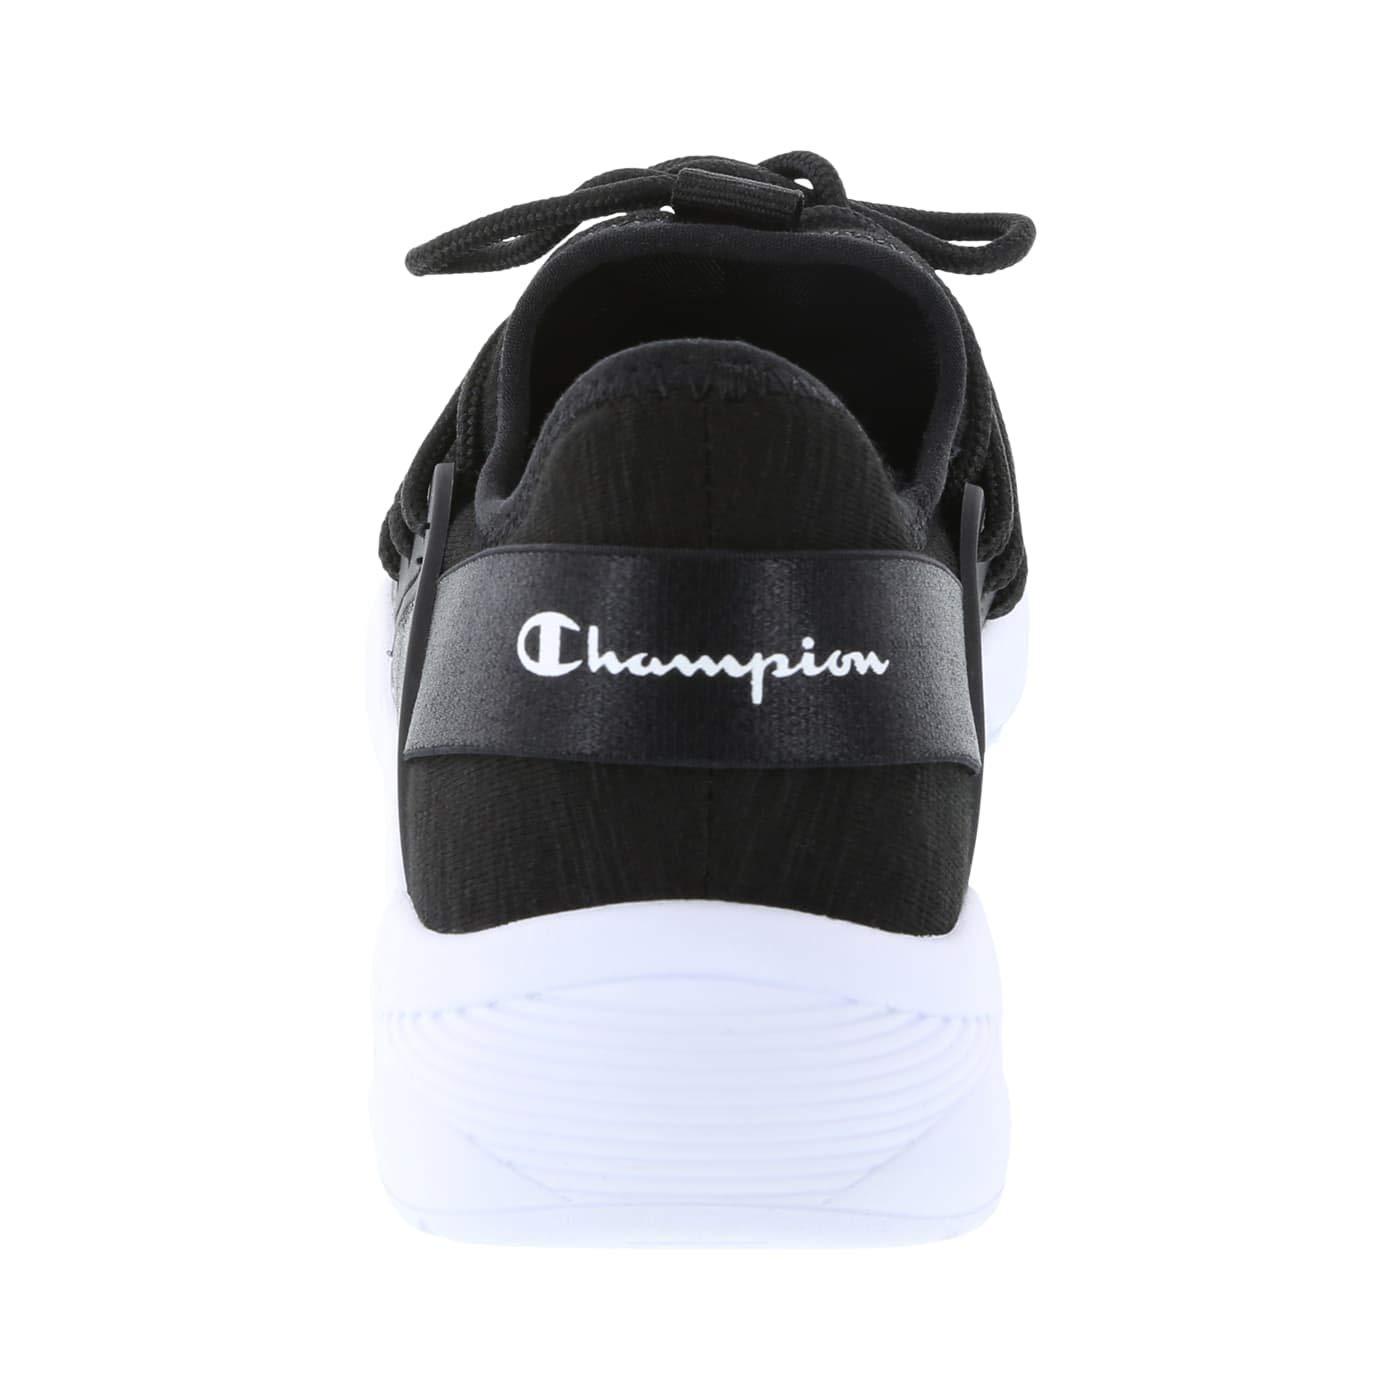 b7b0b62a499 Champion Women s Flash Gore Slip On Sneaker Shoes - Trendy